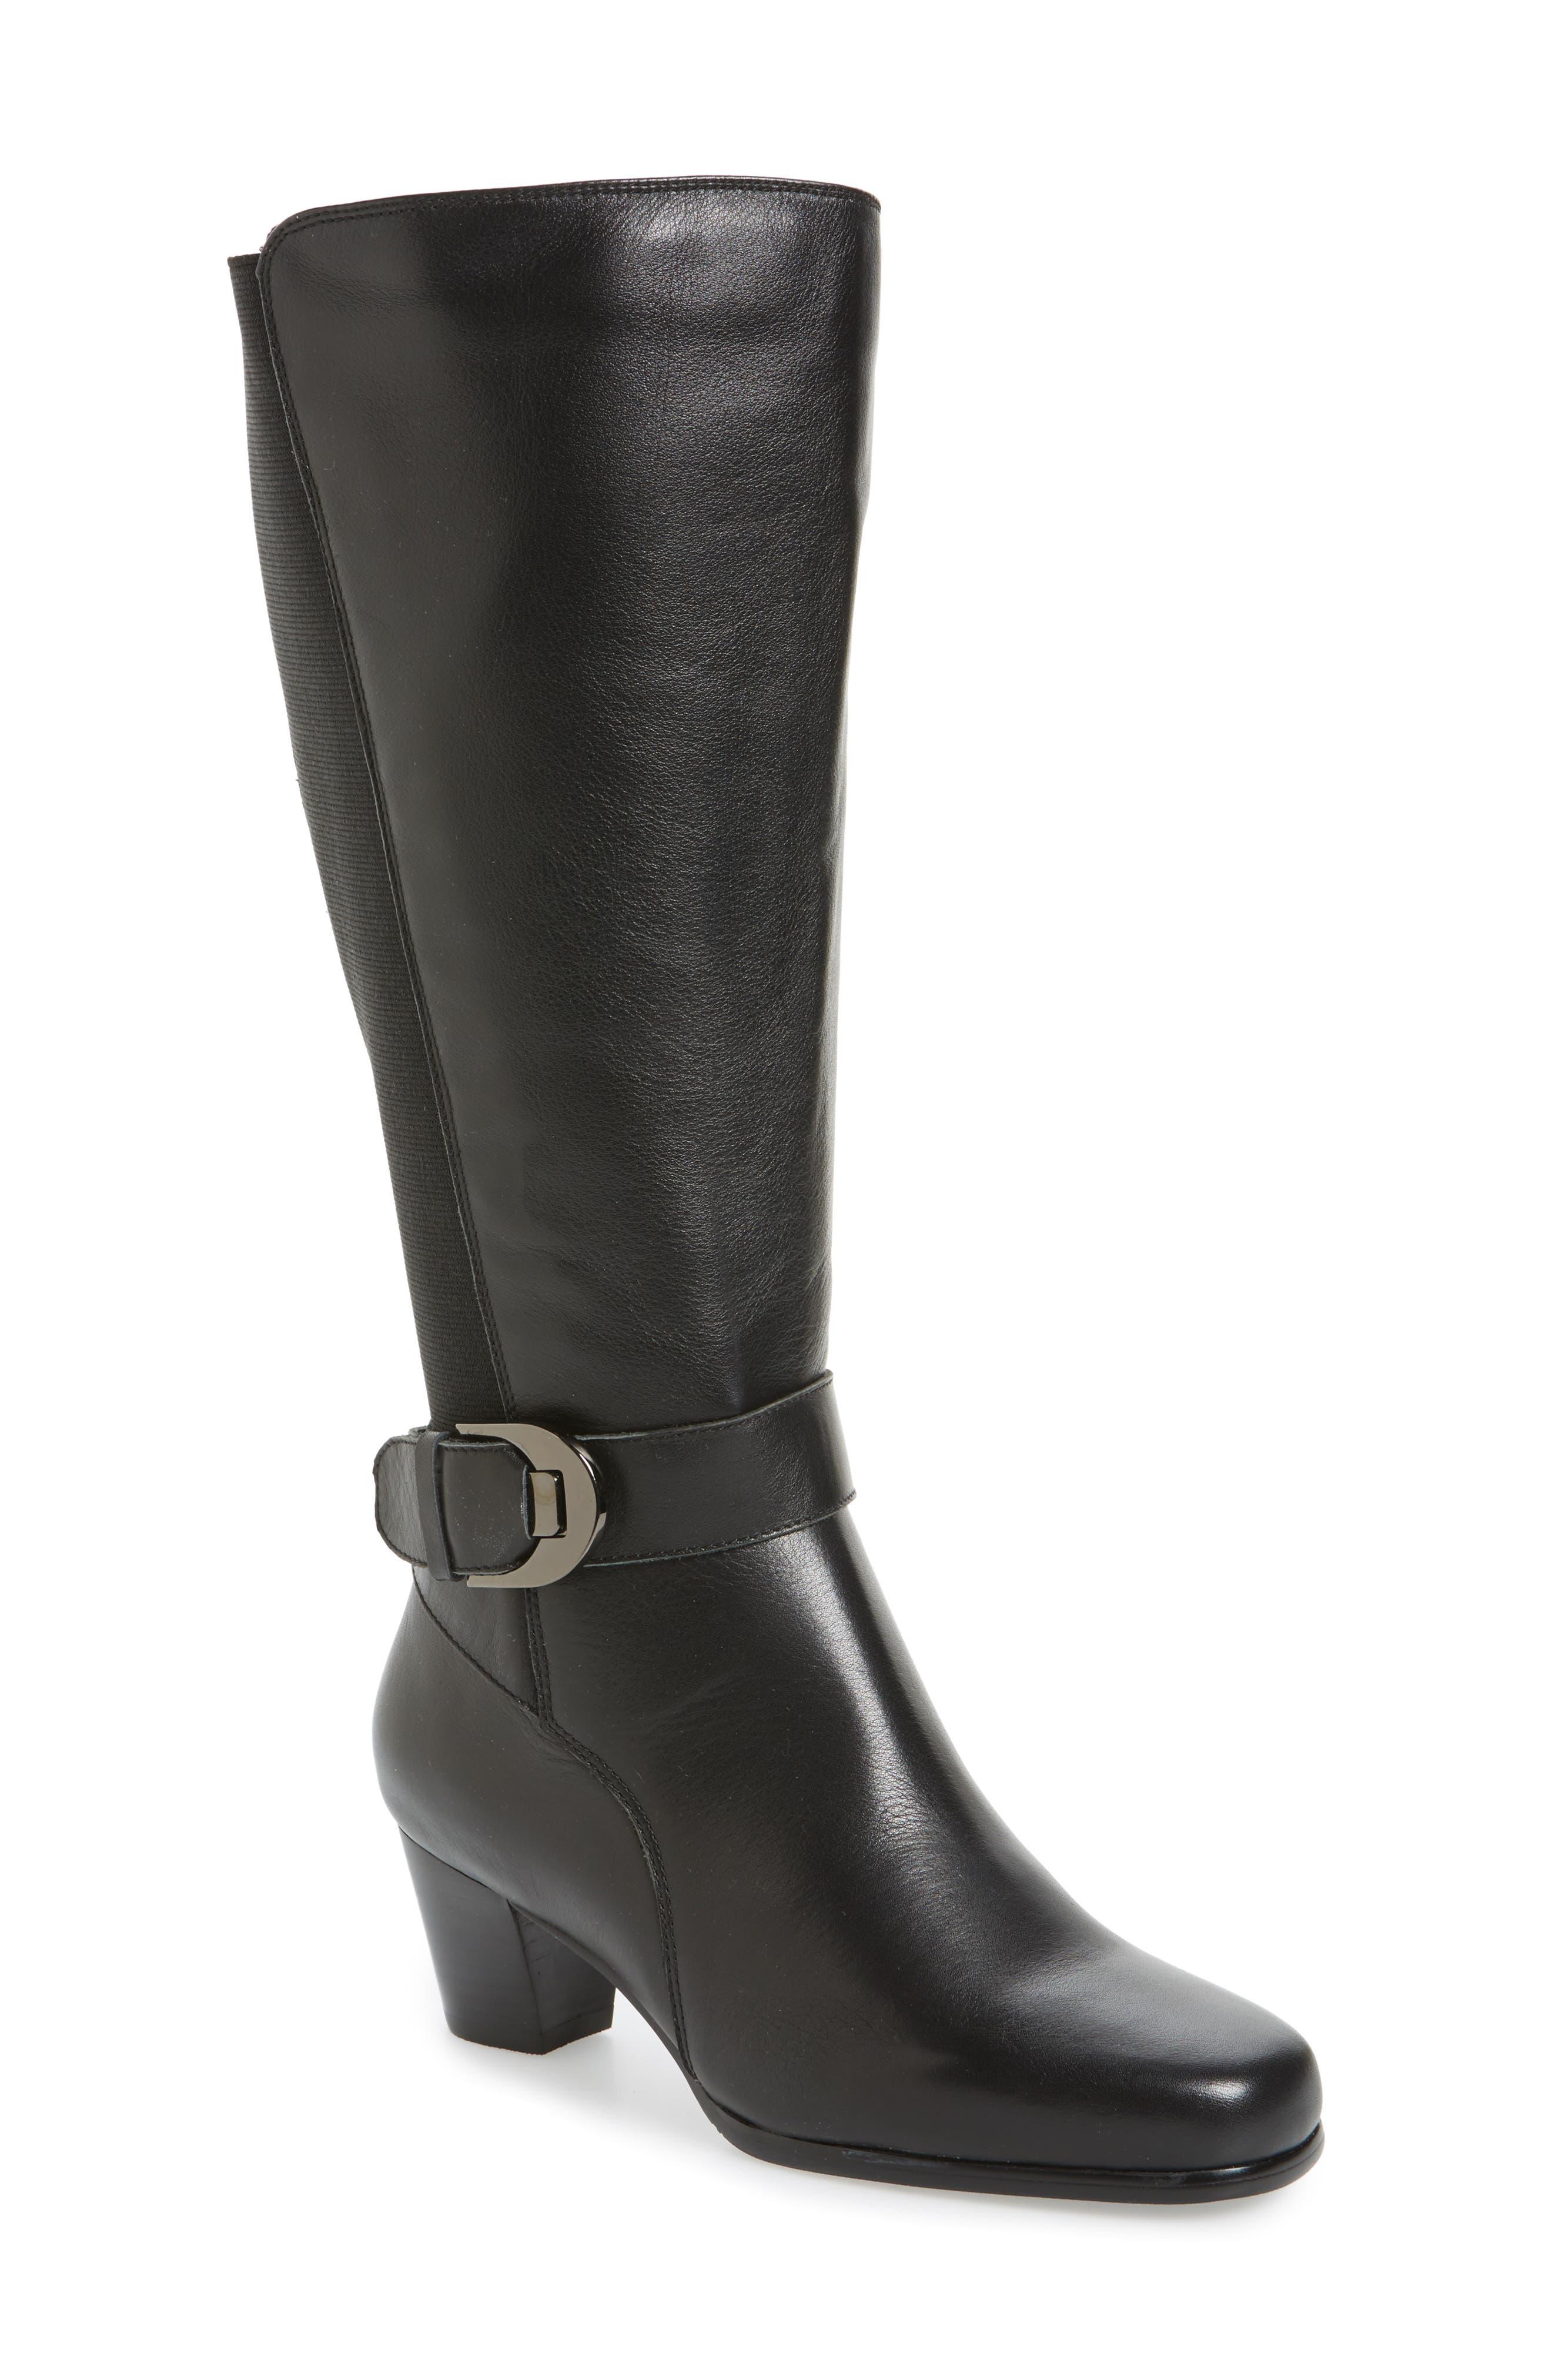 Bonita 18 Boot,                             Main thumbnail 1, color,                             Black Leather Fabric